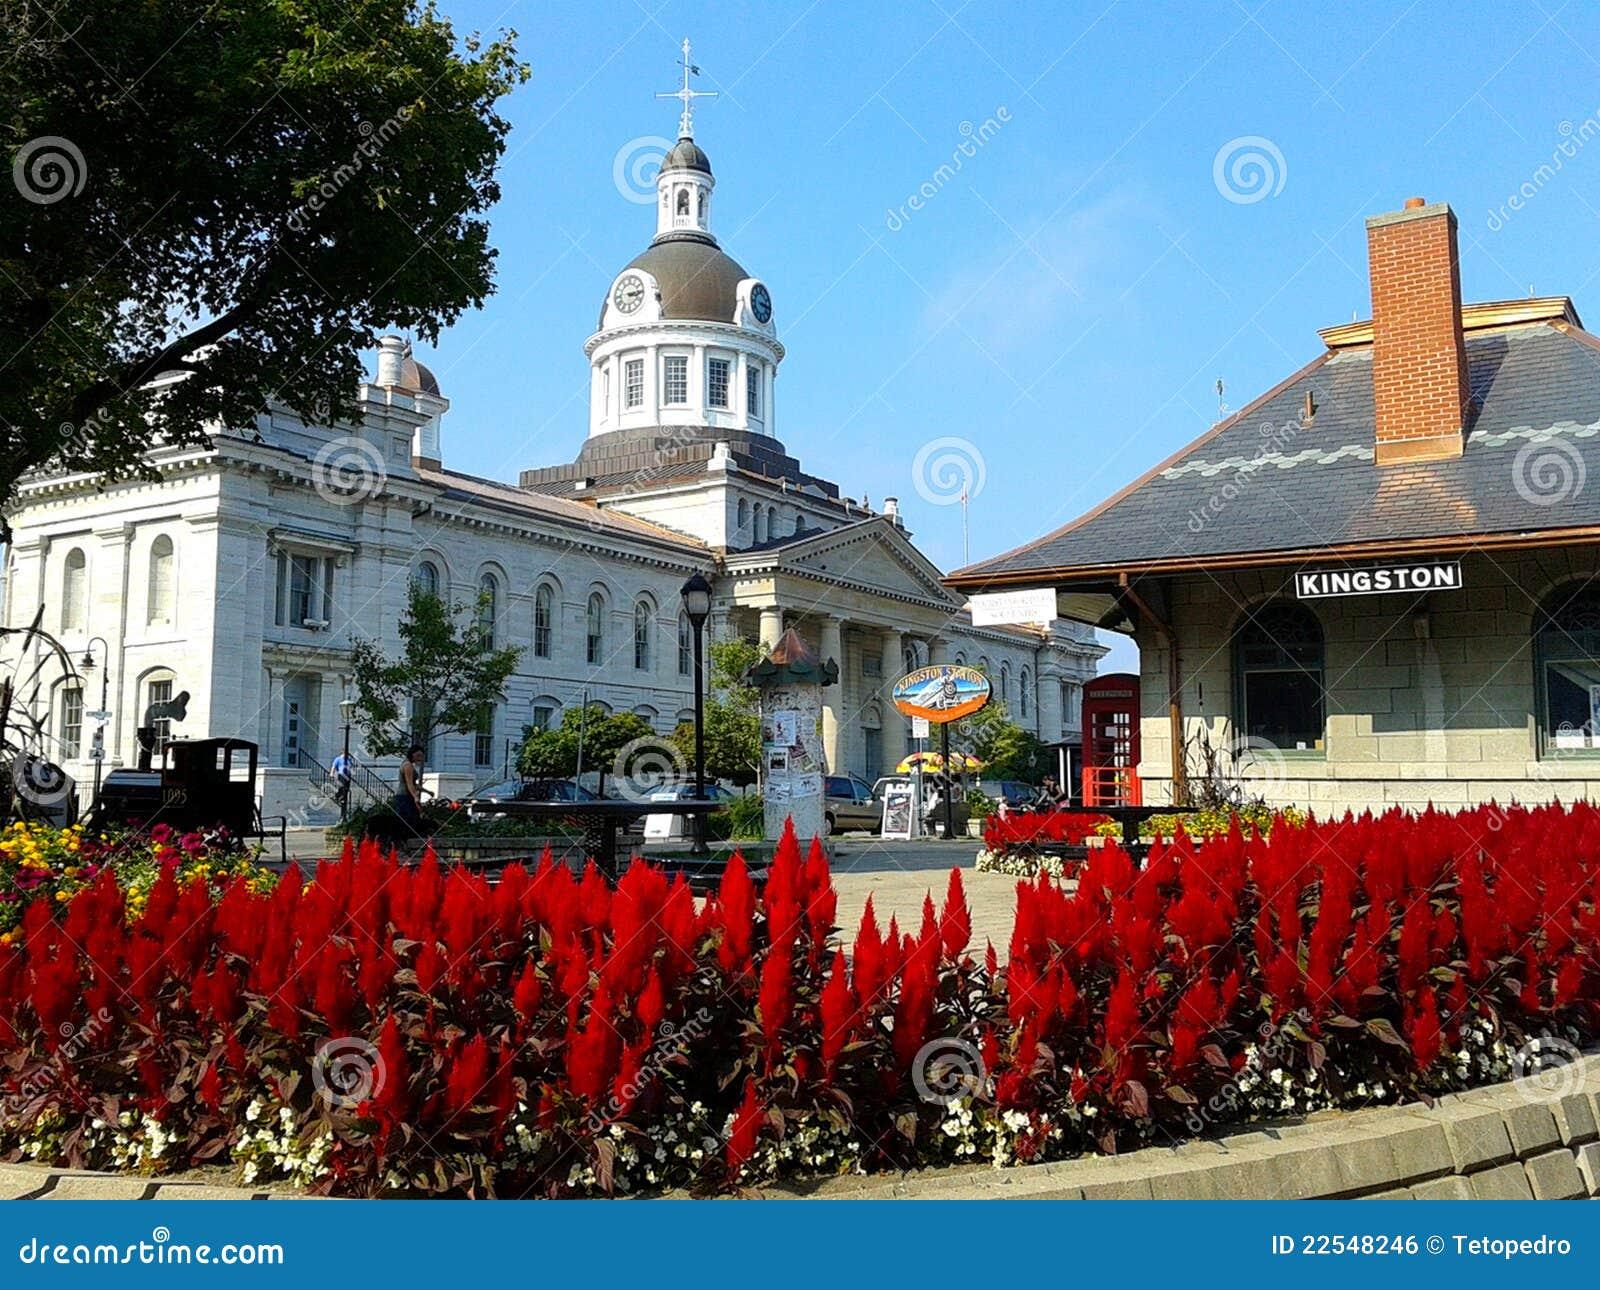 Kingston, Ontario - Canada